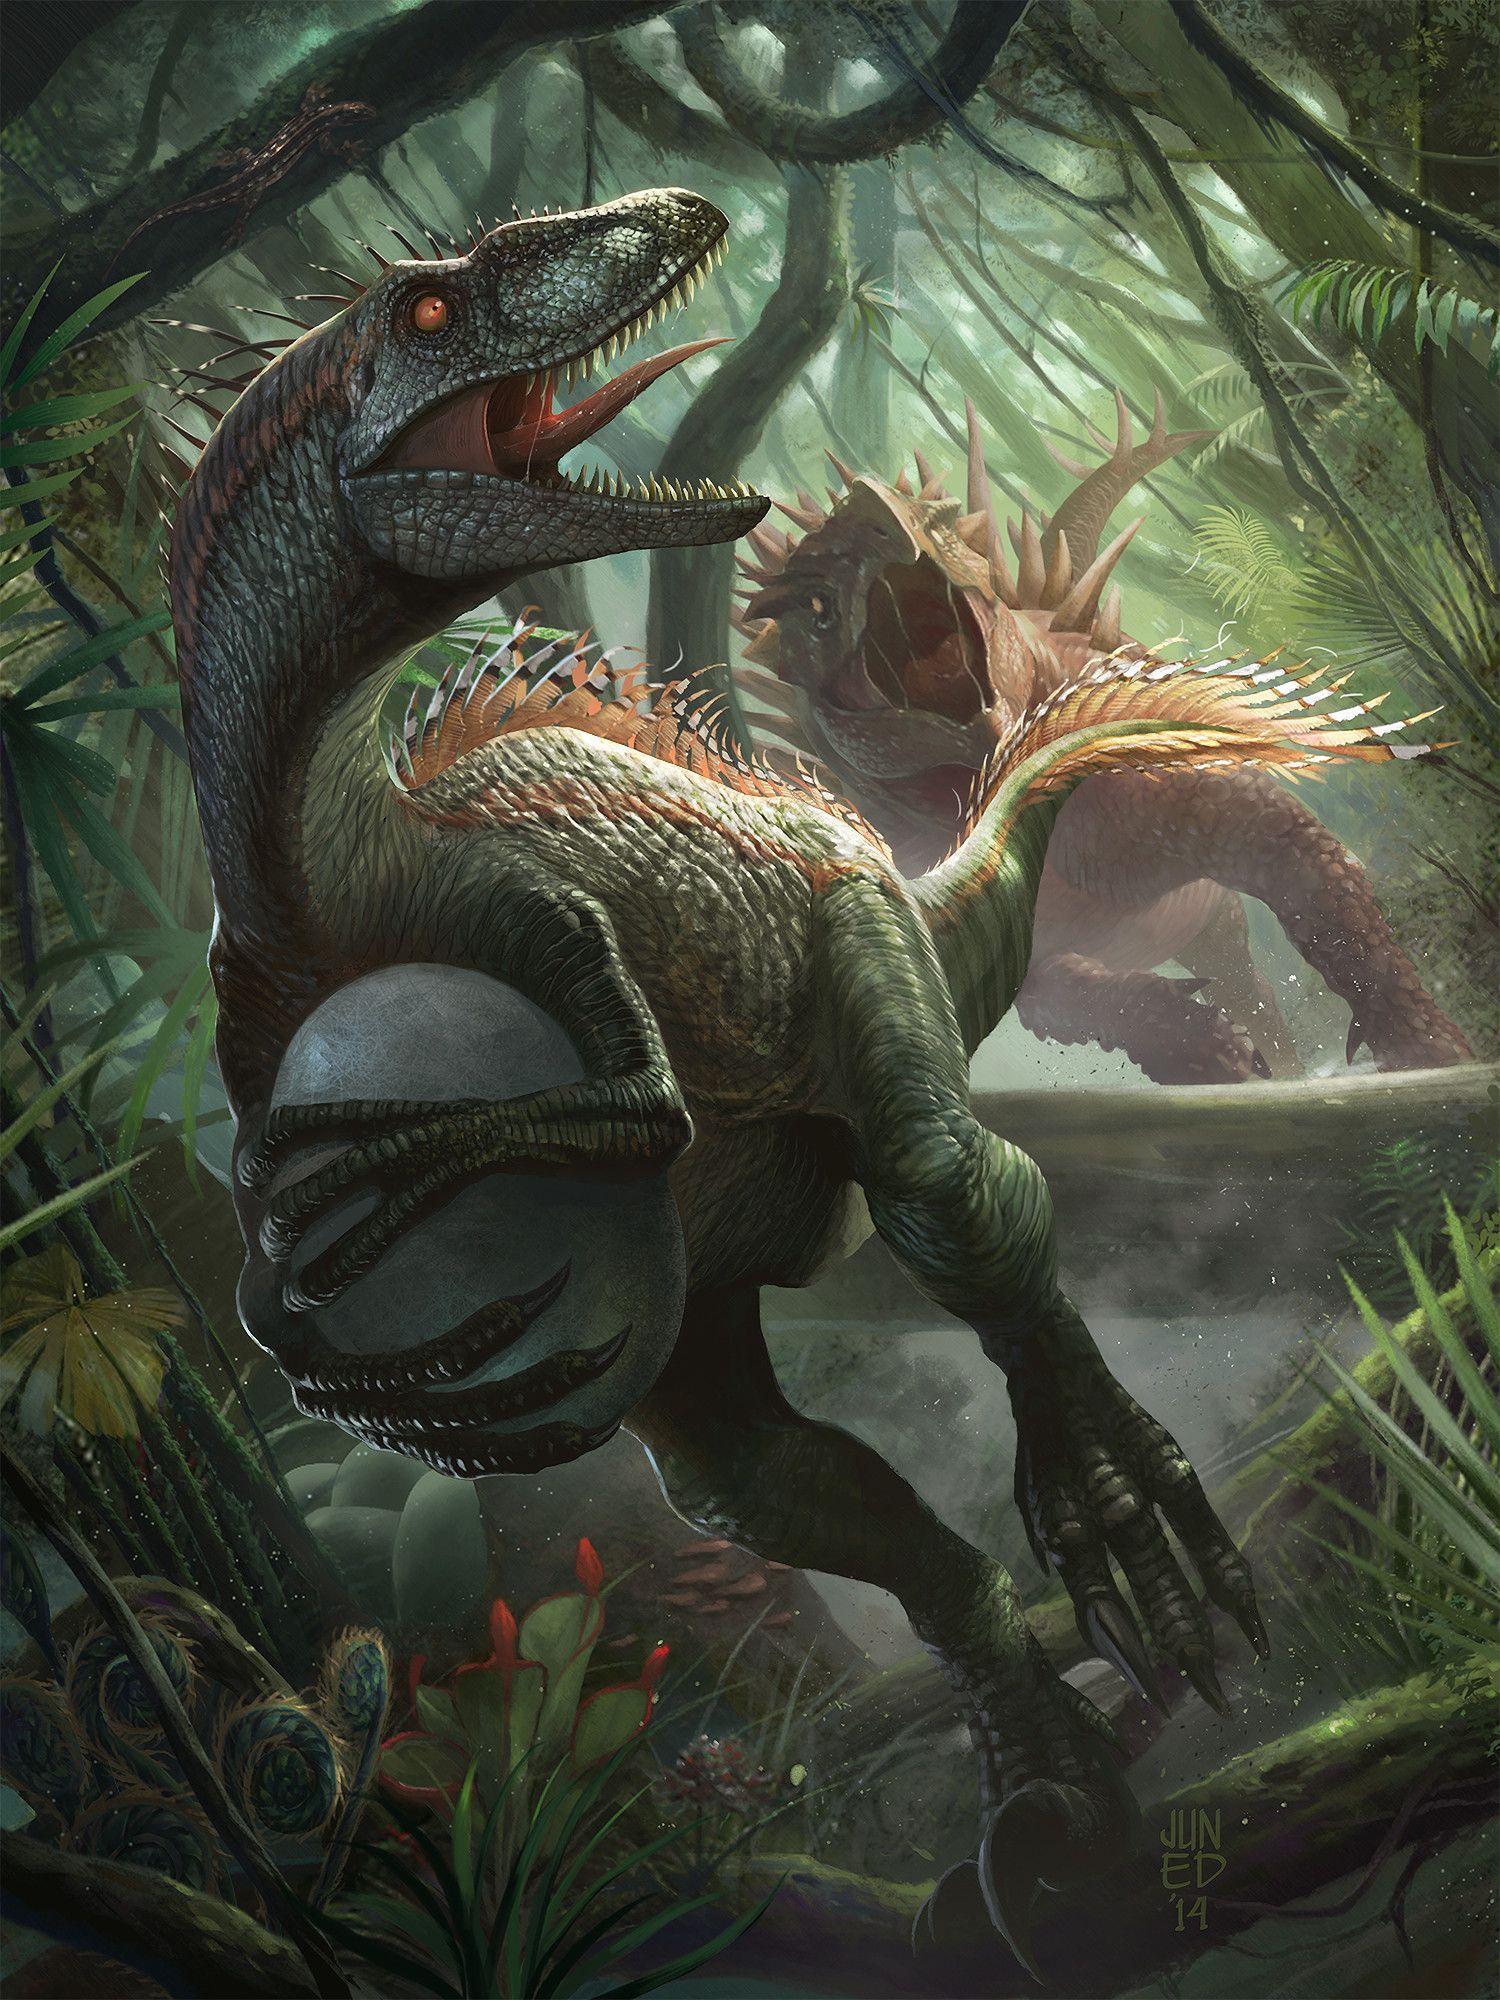 Thief Raptor, Junaidi Lim #prehistoriccreatures ArtStation - 小偷猛禽,Junaidi Lim